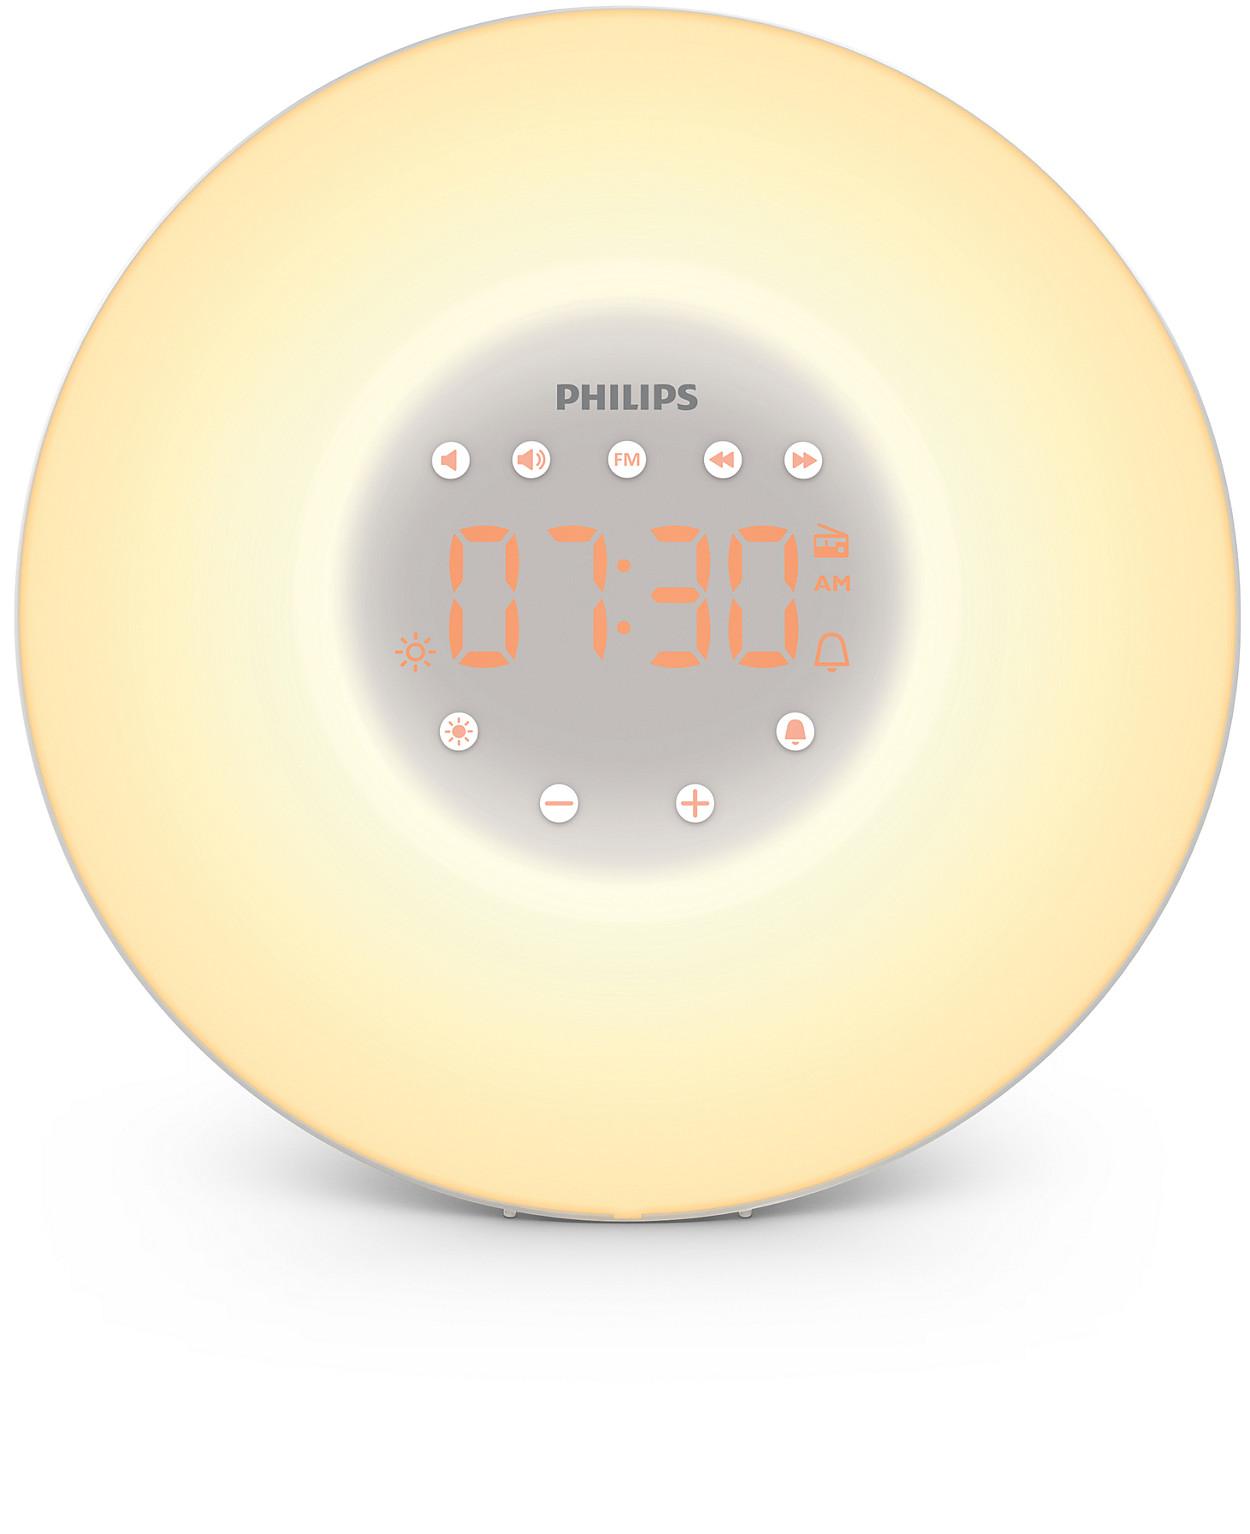 buy the philips wake up light hf3505 60. Black Bedroom Furniture Sets. Home Design Ideas